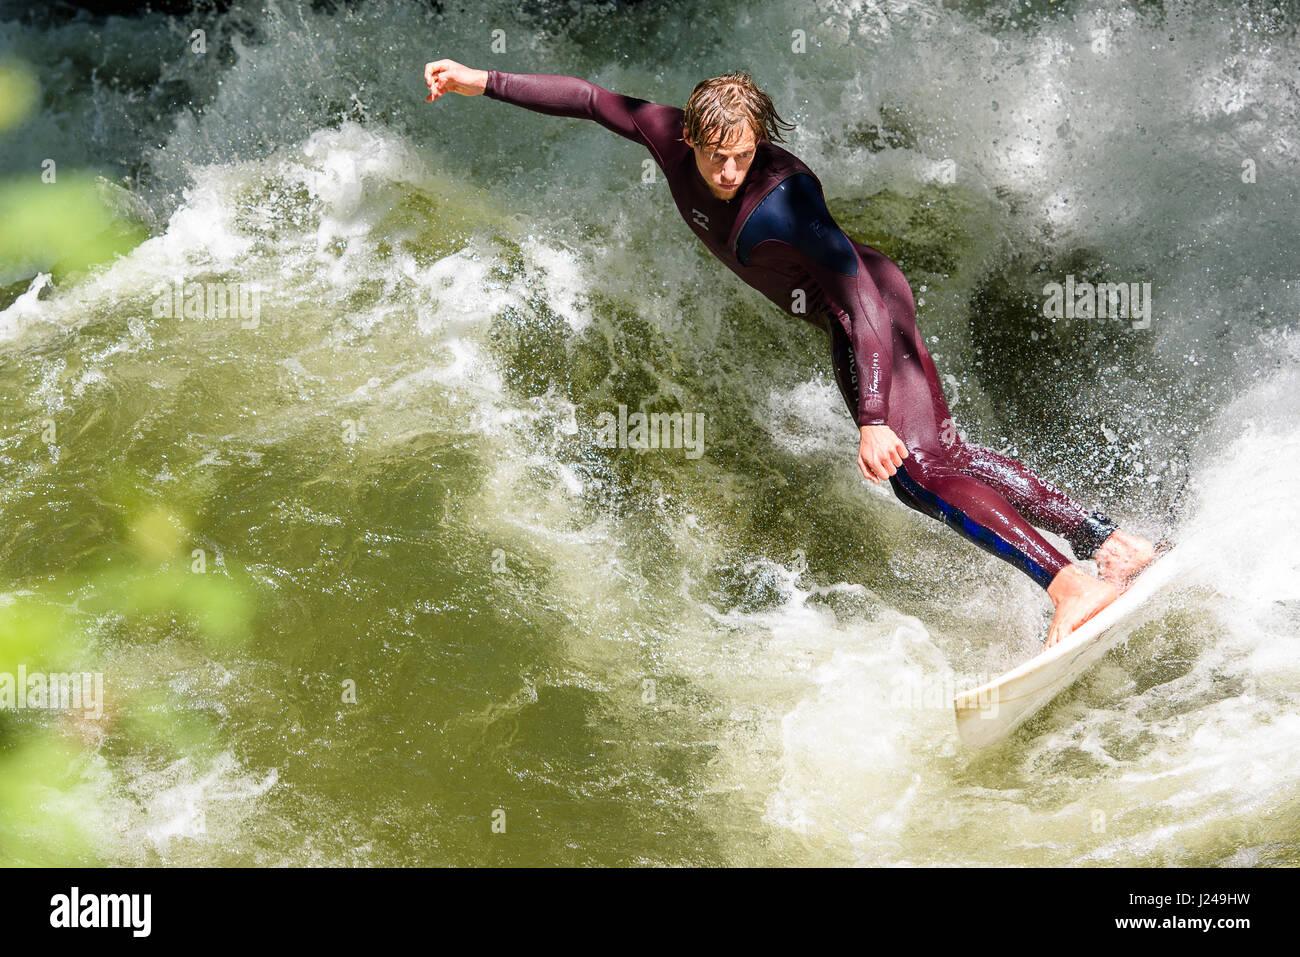 Munich, Germany. 24th Apr, 2017. A man surfs in the English Garden in Munich, Germany, 24 April 2017. Photo: Florian - Stock-Bilder